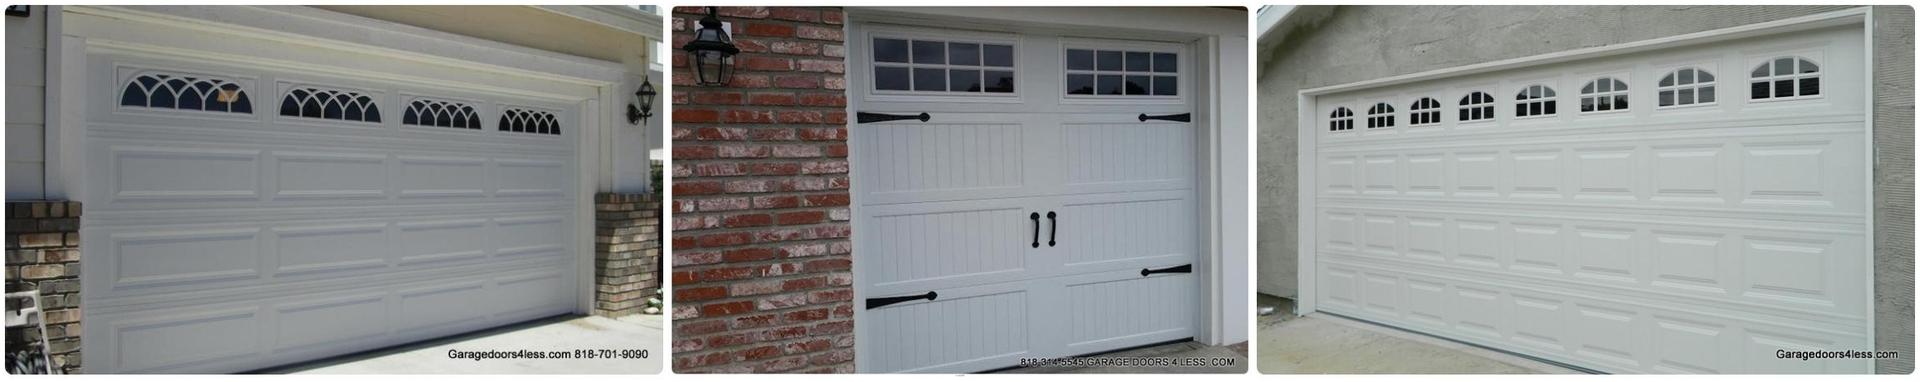 Garage Doors 4 Less Garage Doors Repairs Northridge California